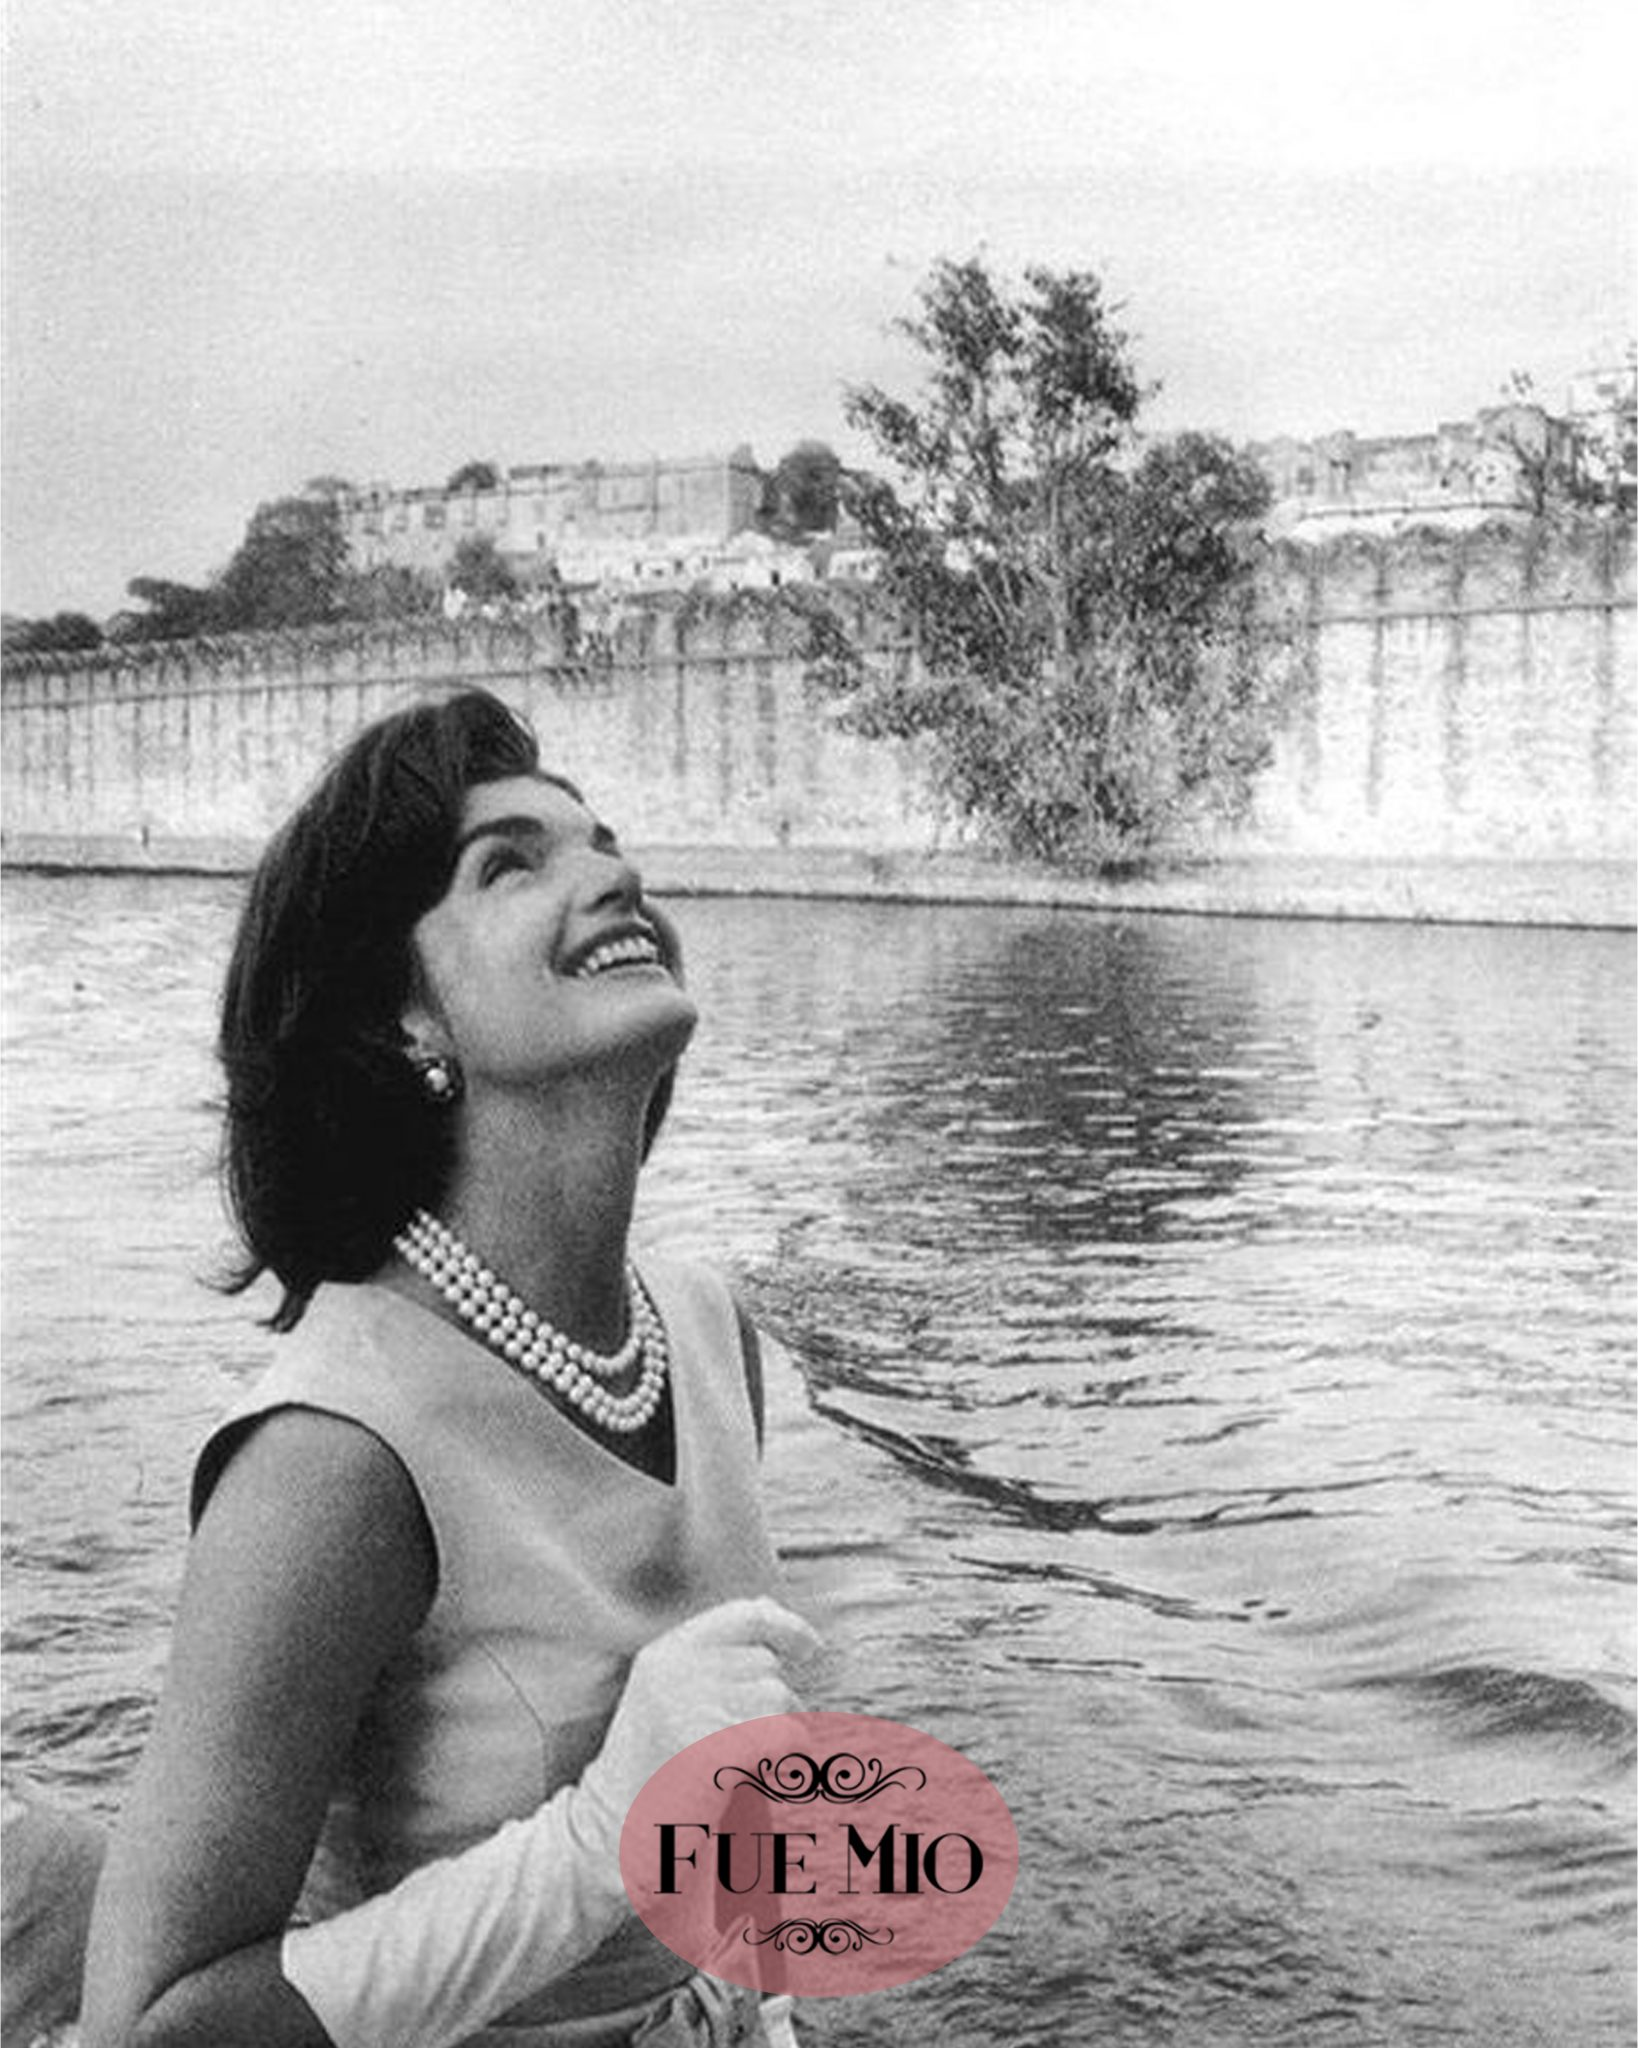 Fue Mio Vintage Iconos Personajes moda Jackie Kennedy